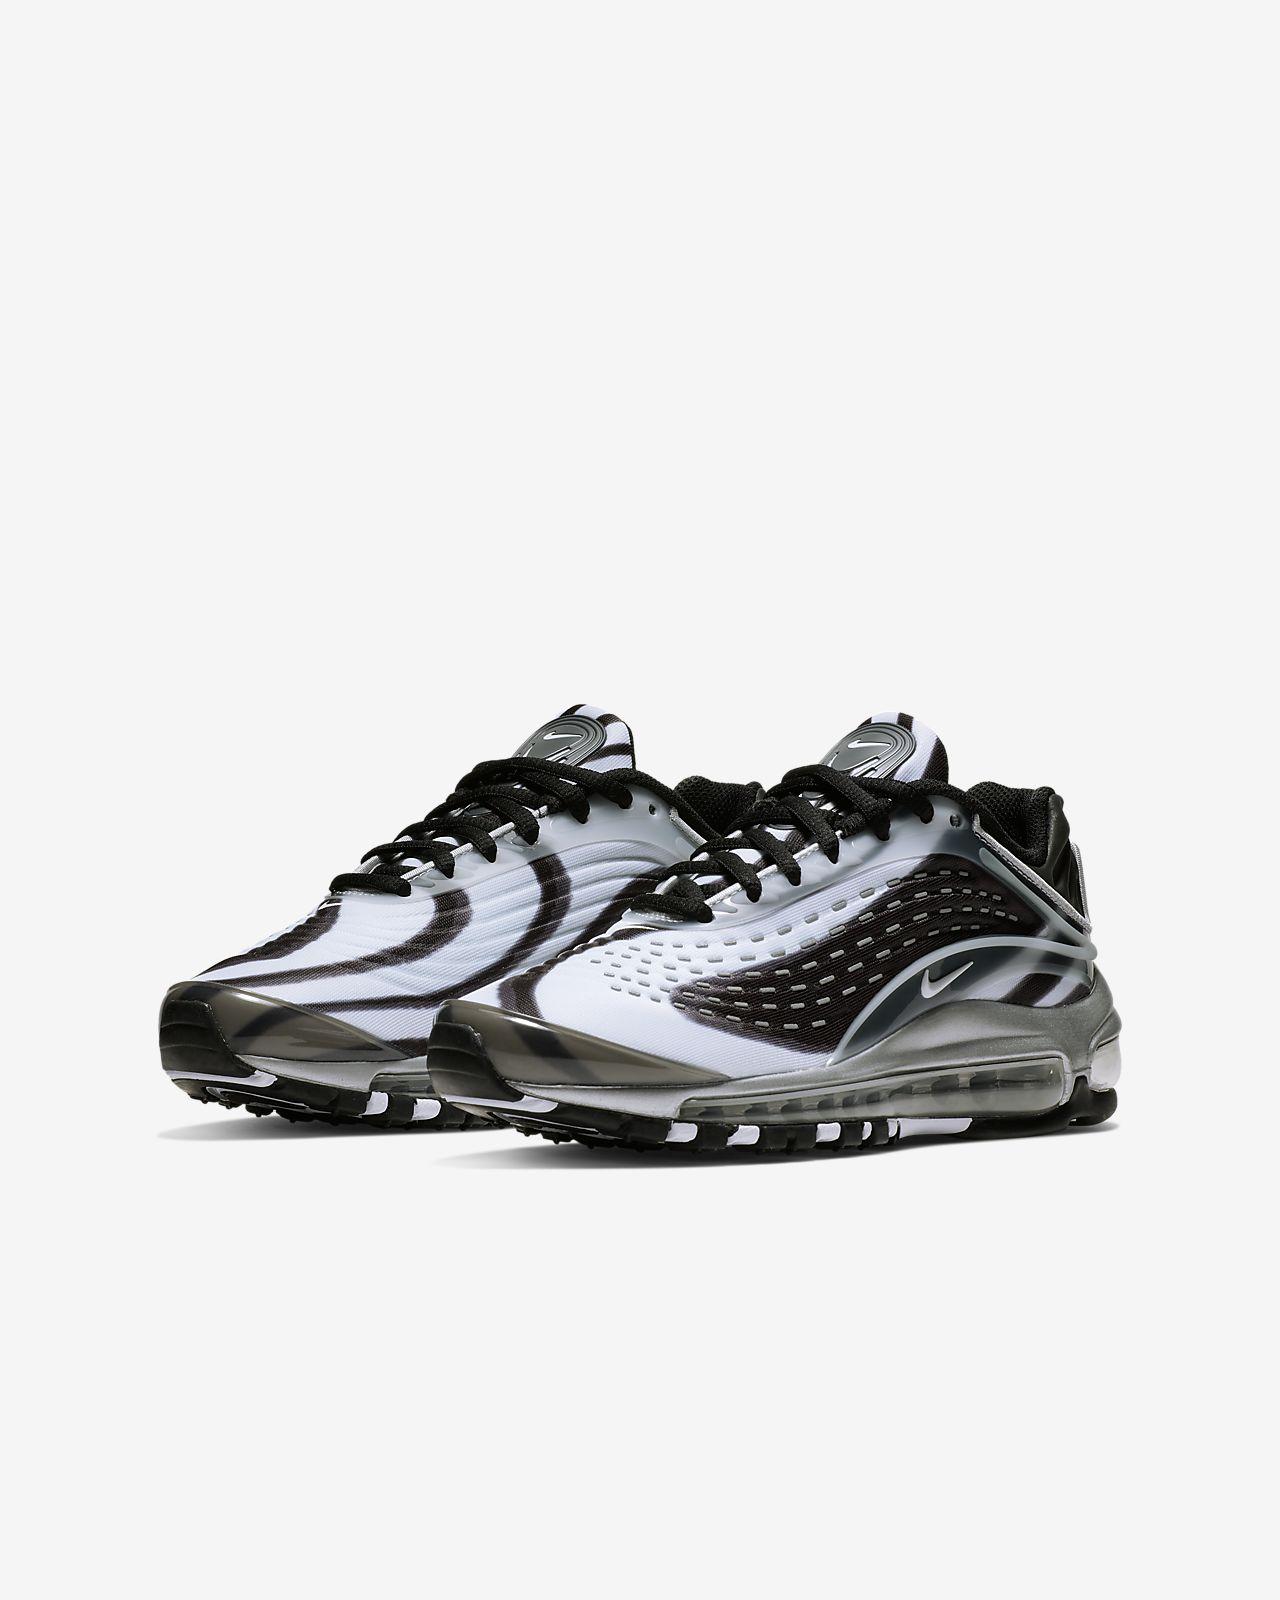 san francisco a534a c6812 ... Nike Air Max Deluxe Big Kids  Shoe